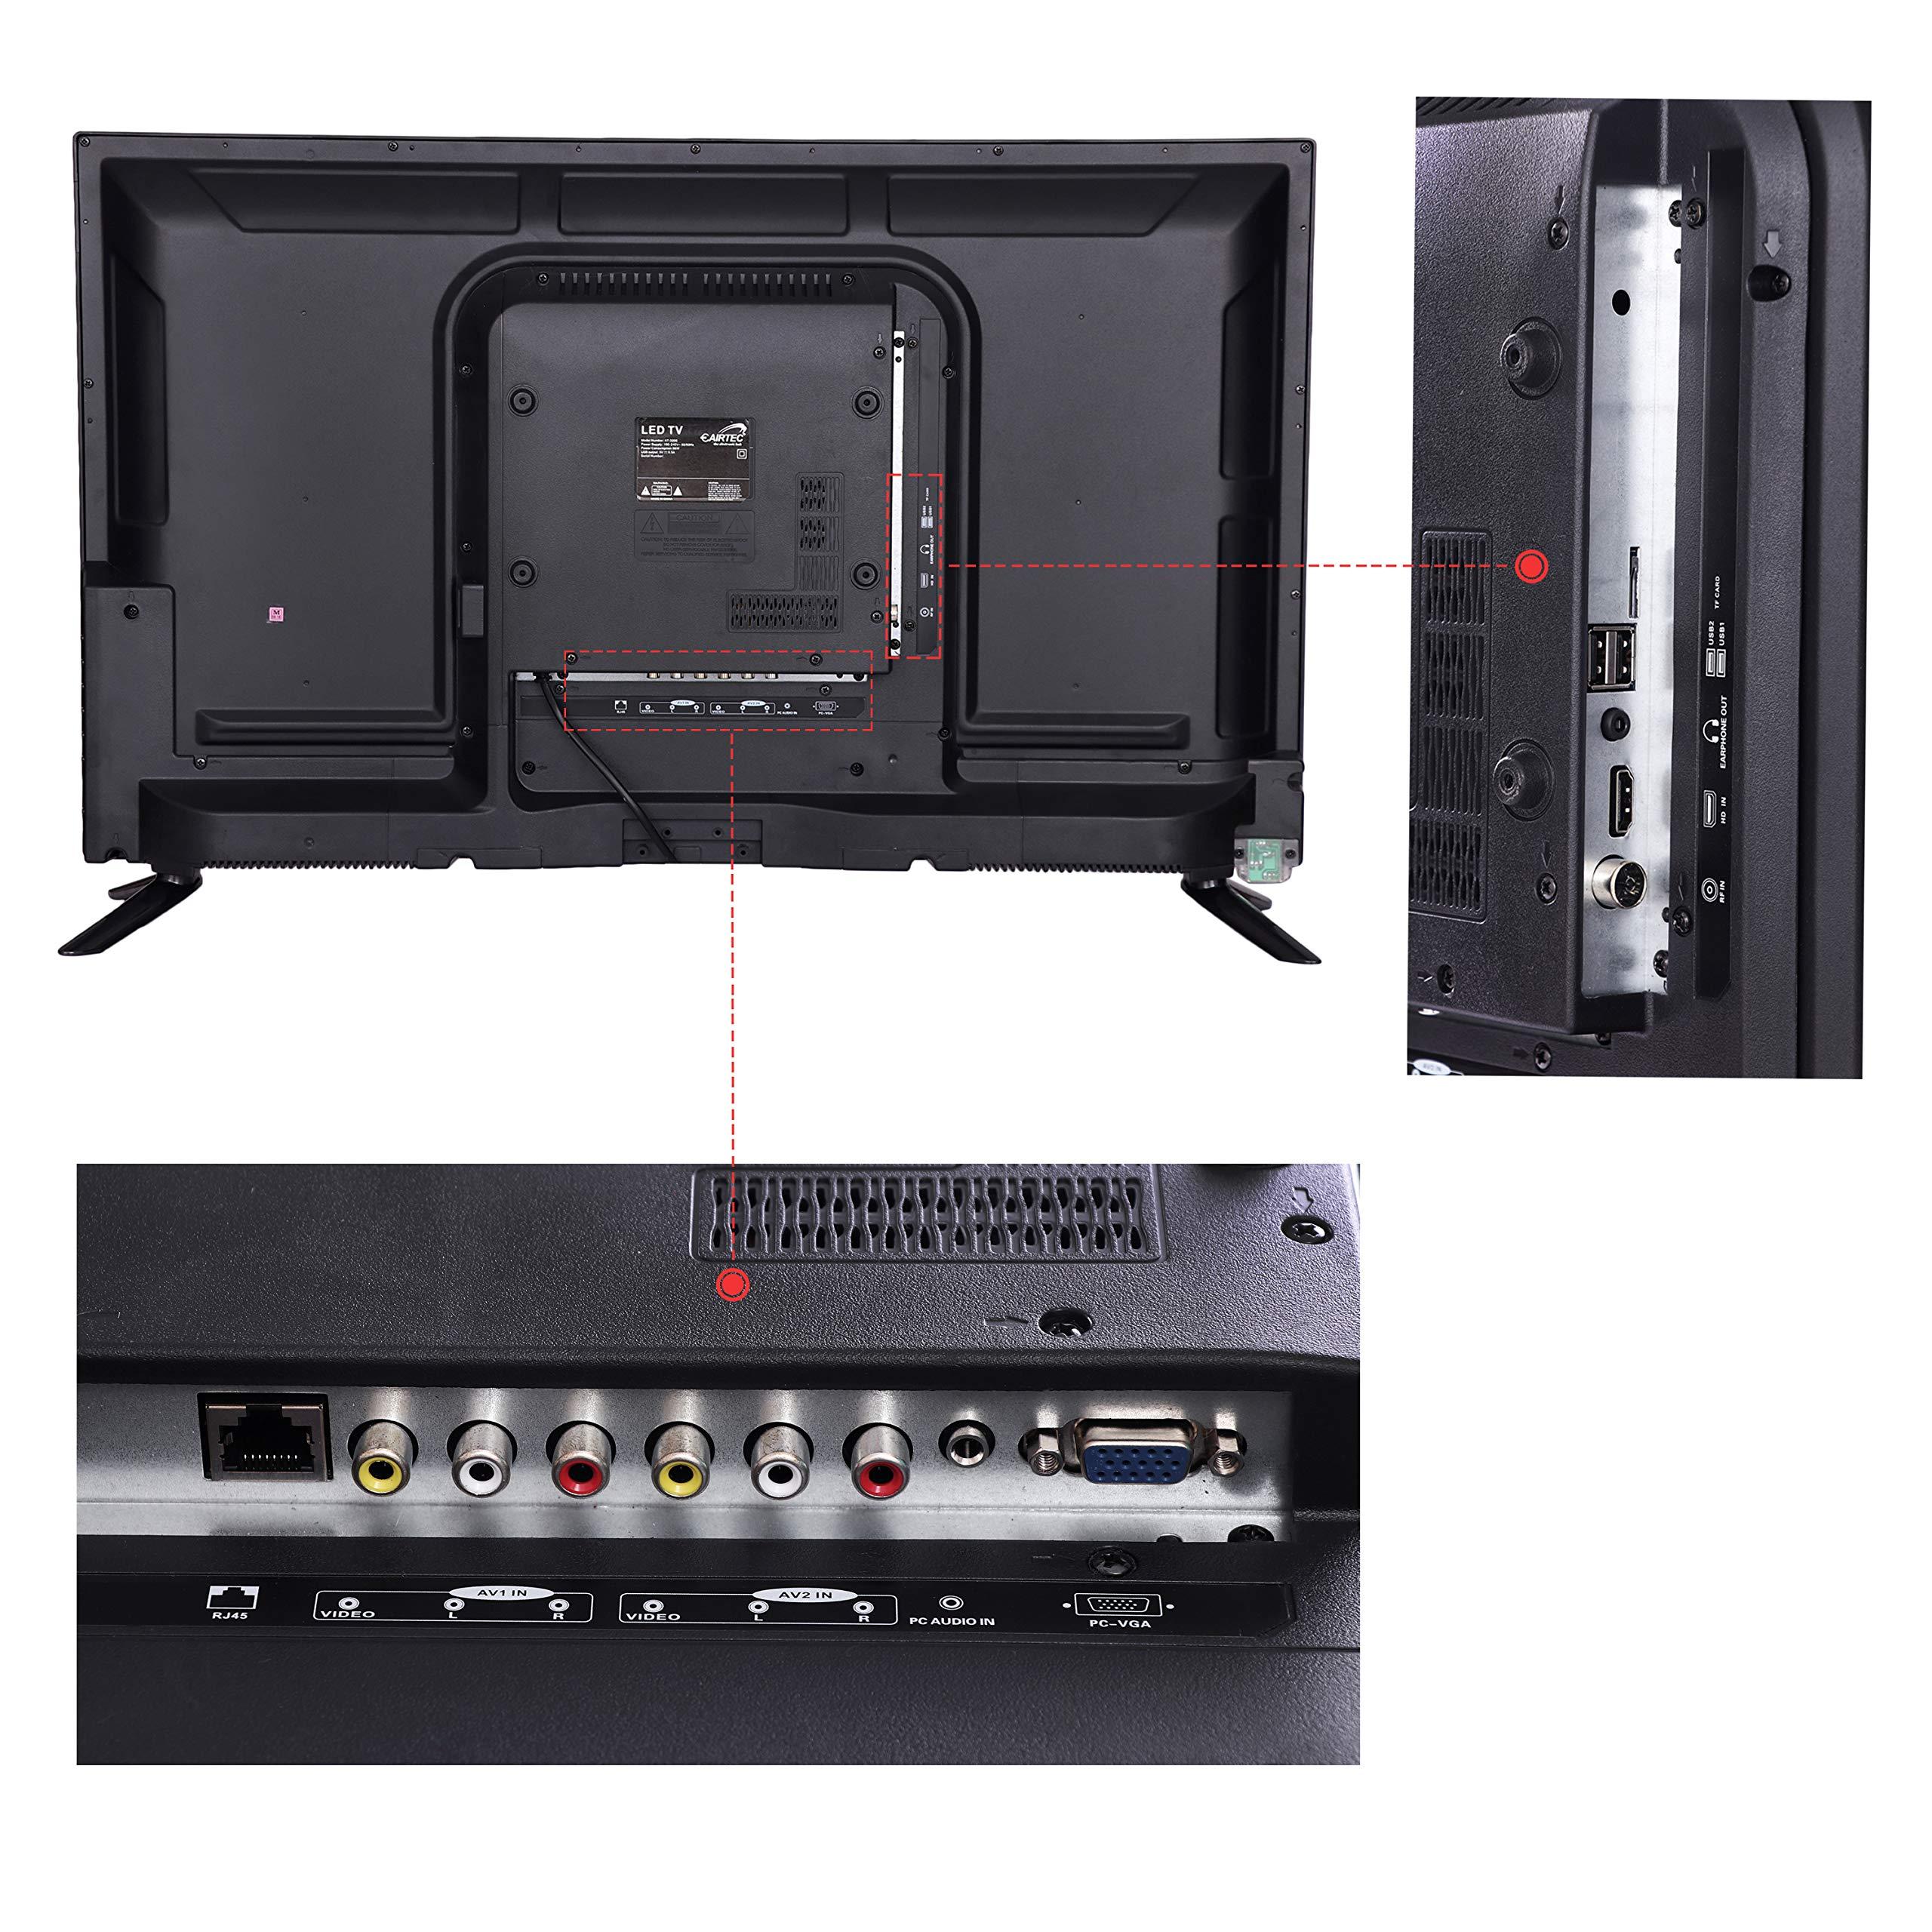 eAirtec 81 cm (32 inches) HD Ready Smart LED TV 32DJSM (Black)